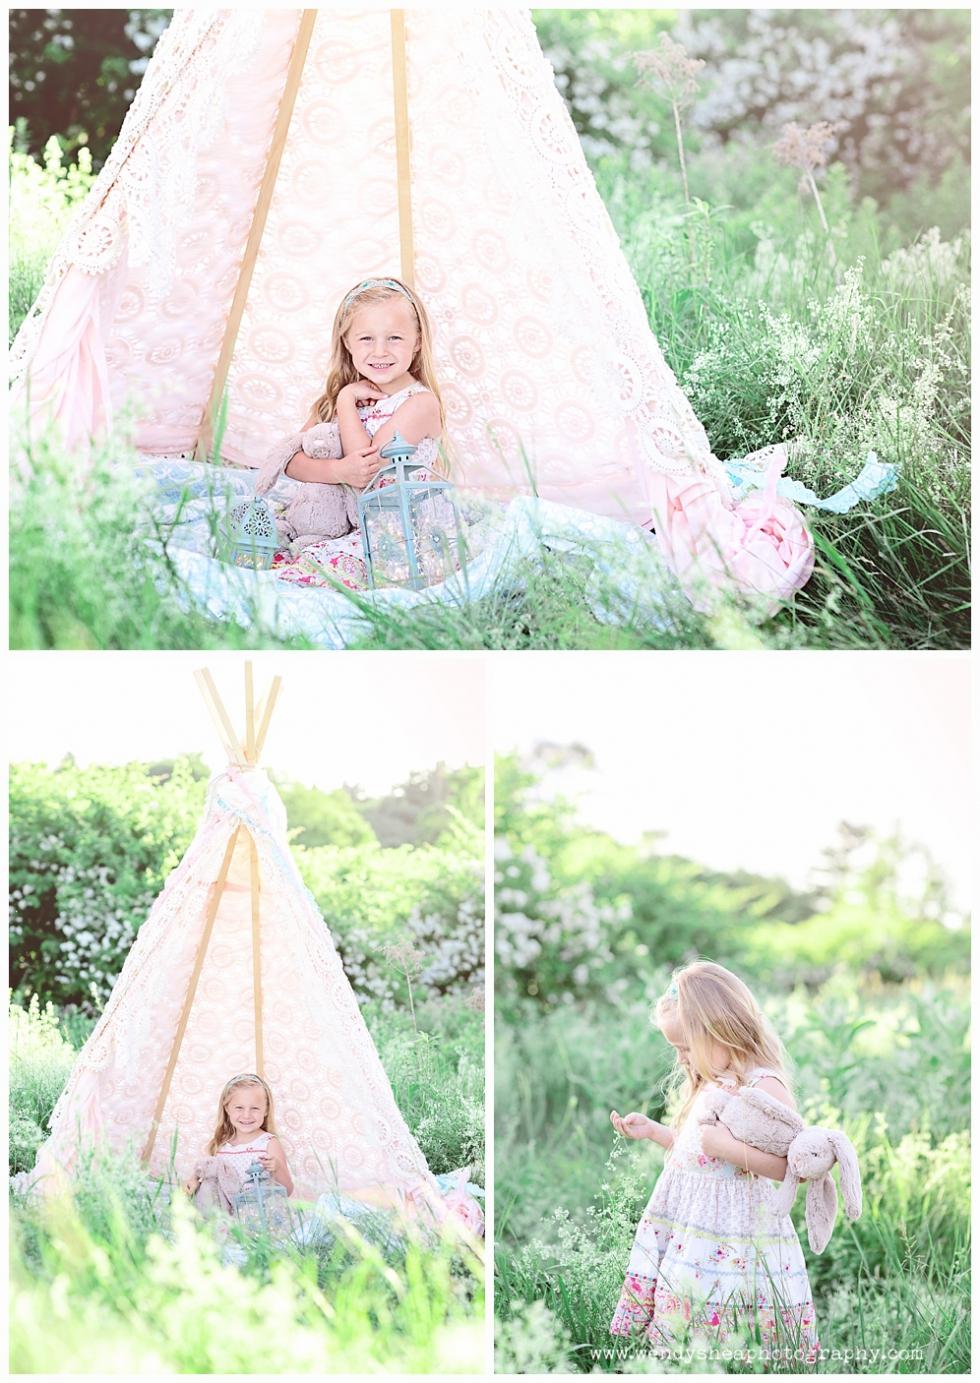 WendySheaPhotography_Massachusetts_Children_Photographer_0004